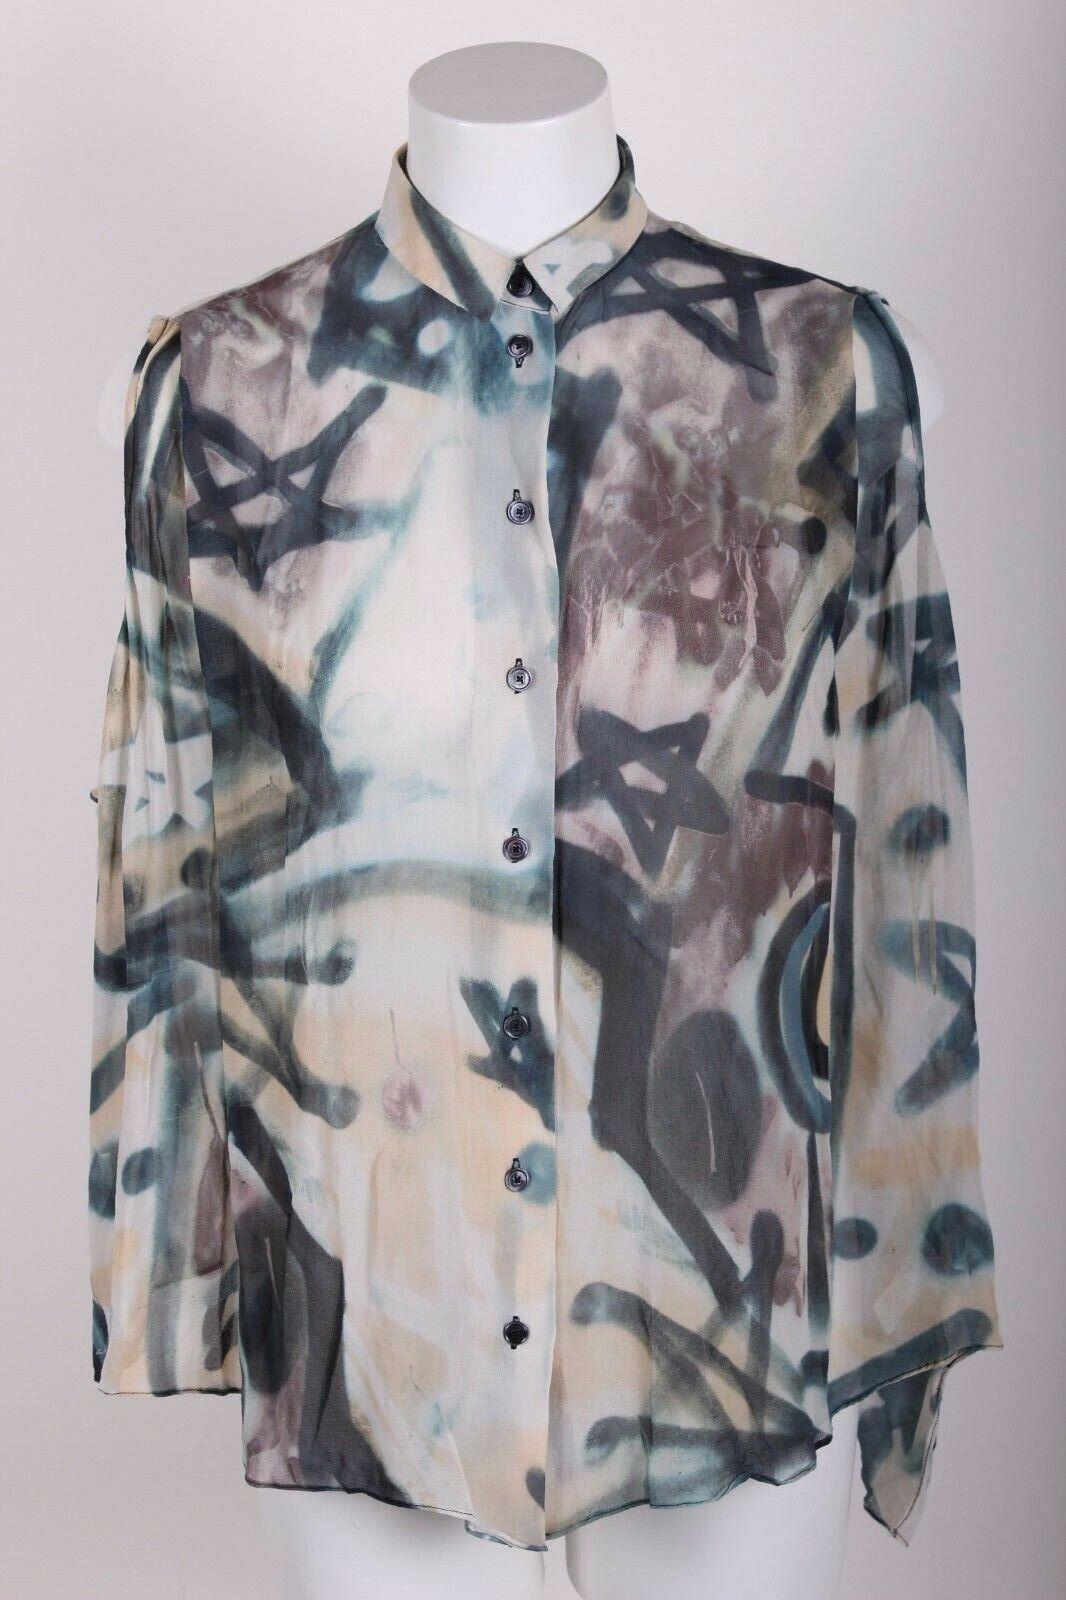 ACNE STUDIOS Shirt SZ 34 XS Silk 'Tauri' Graffiti Print Silk Blouse Top